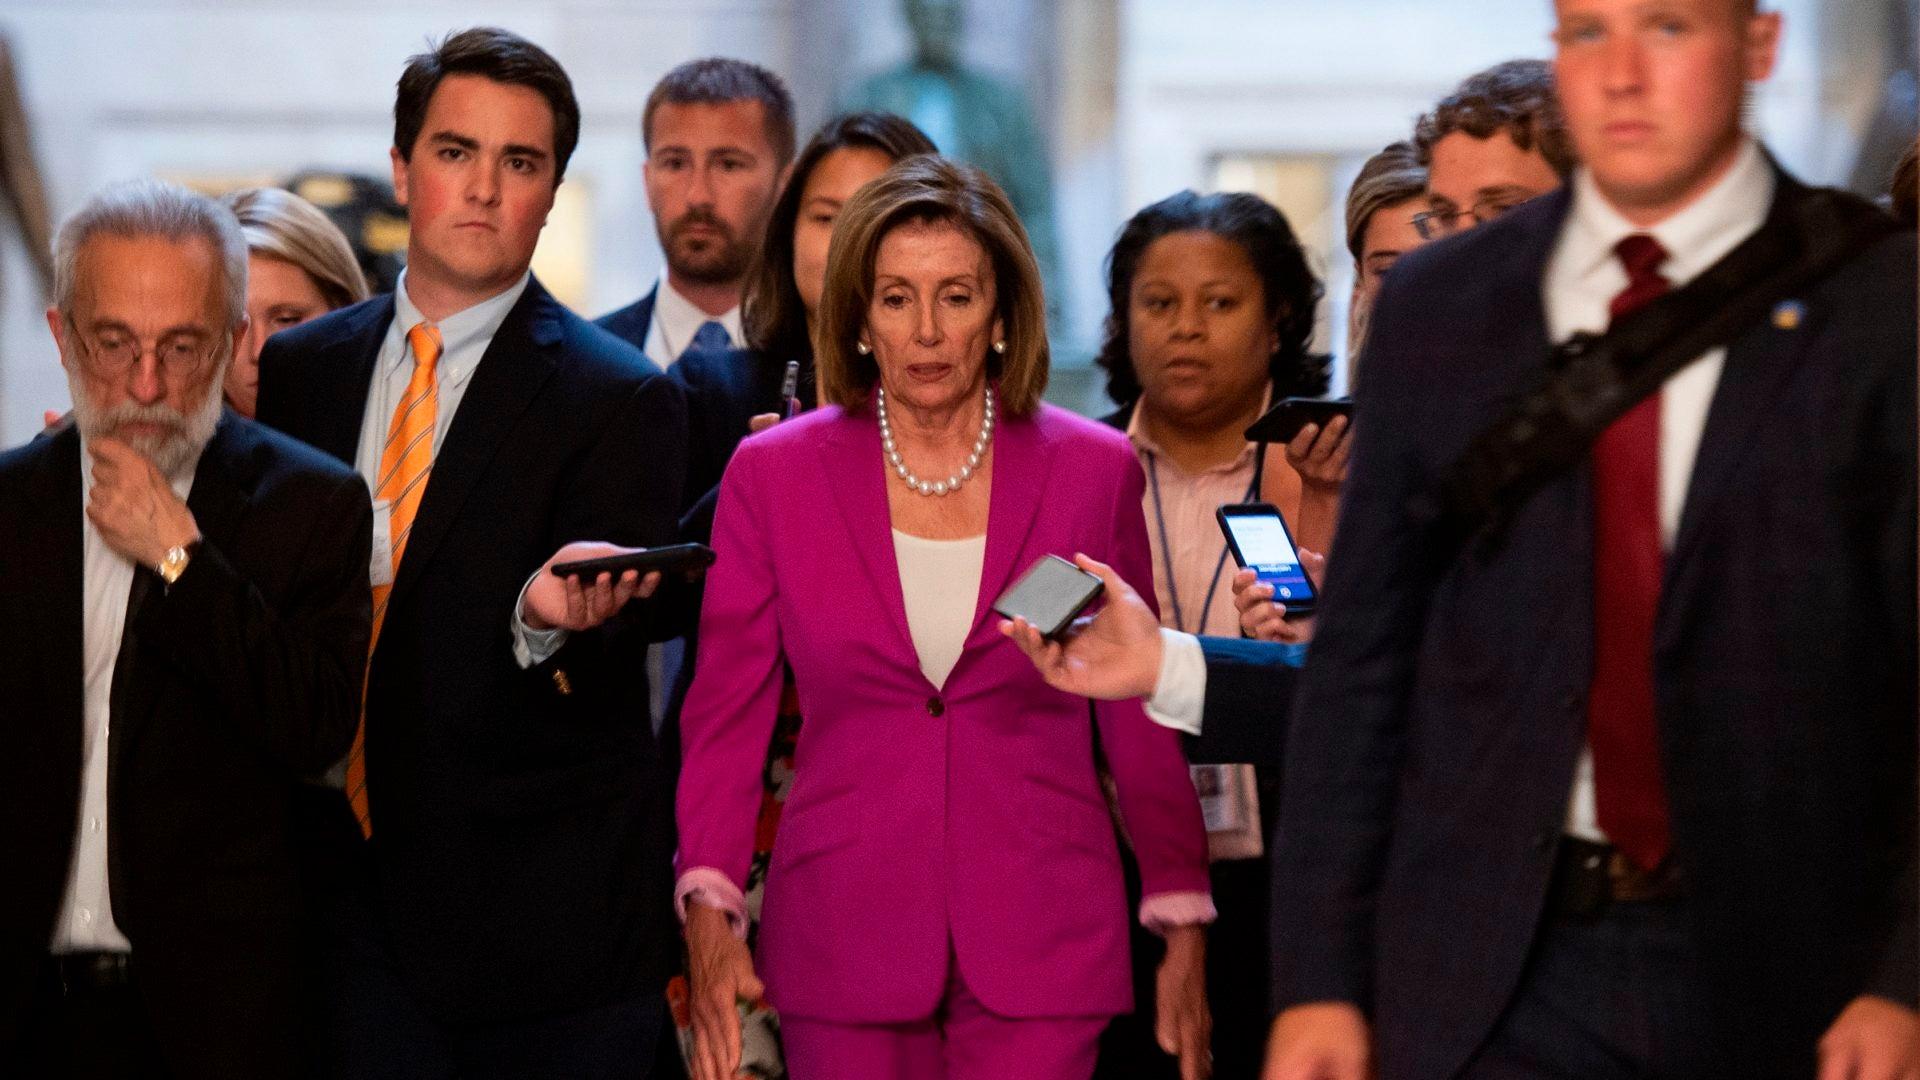 House Condemns Donald Trump's Racist Tweets, Language